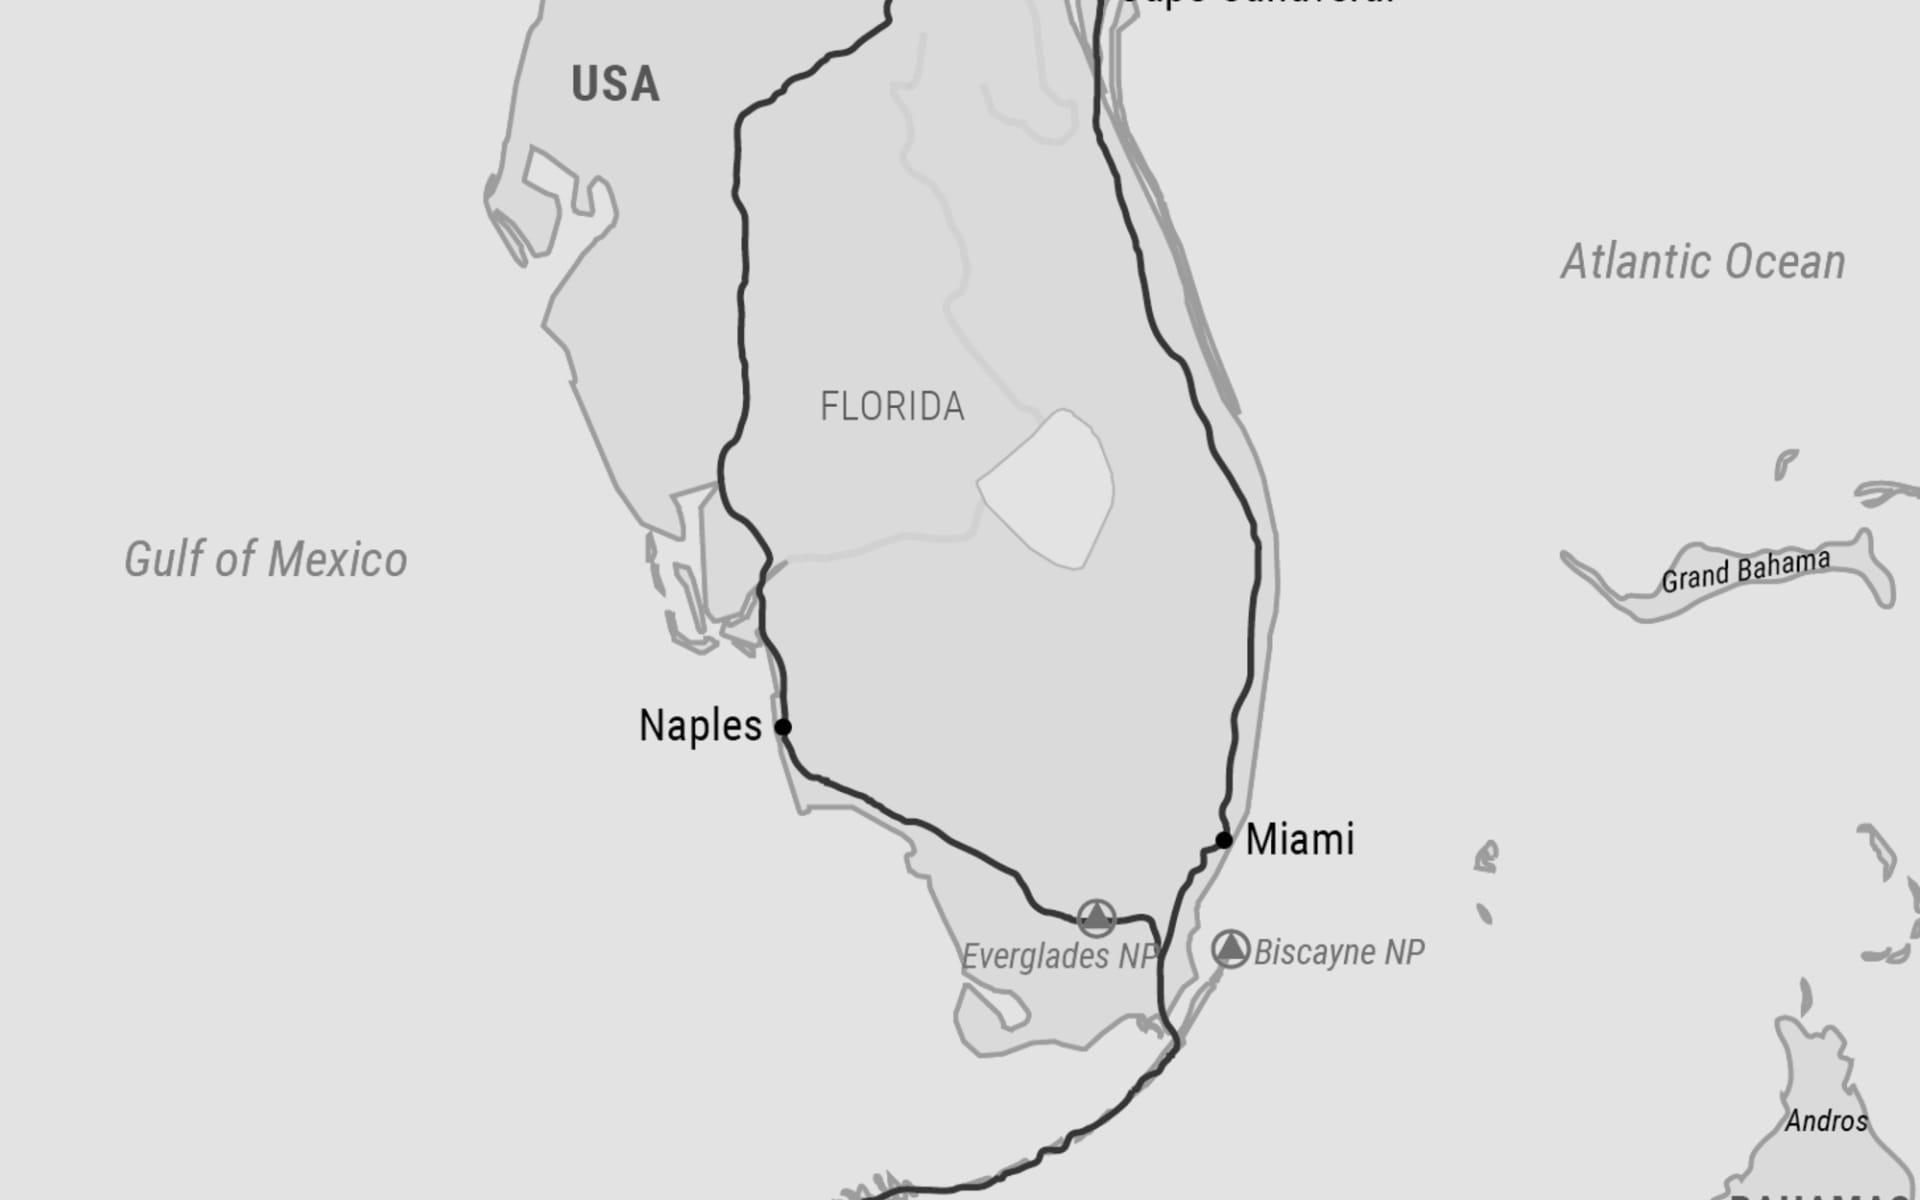 Florida tage rundreise bus 10 USA Rundreise